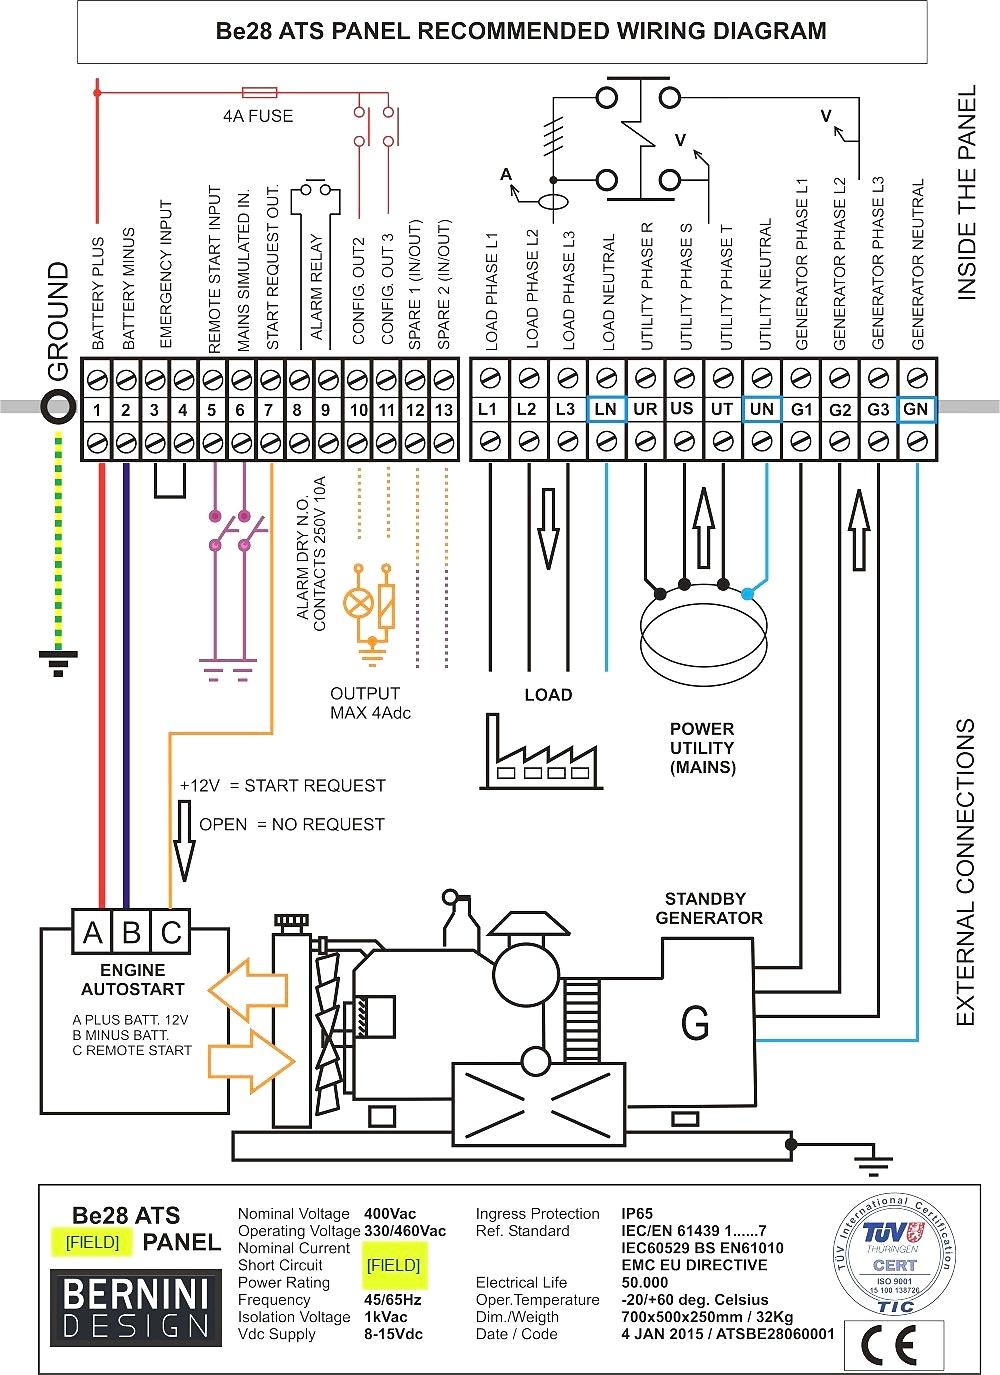 Standby Generator Wiring Diagram